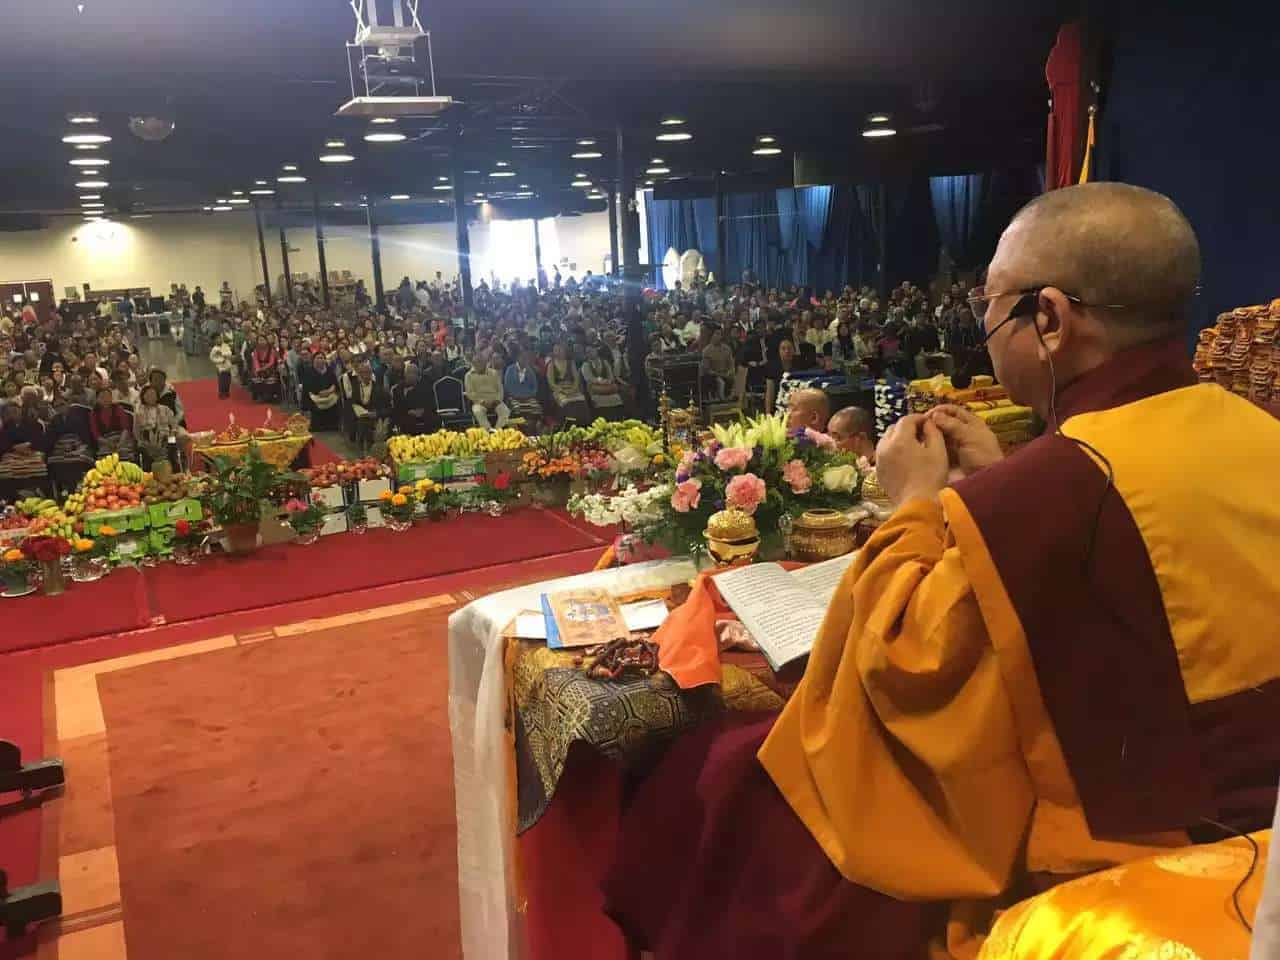 gosok-rinpoche-toronto-2016-9ea1544c640fbdbe38889f607e64854